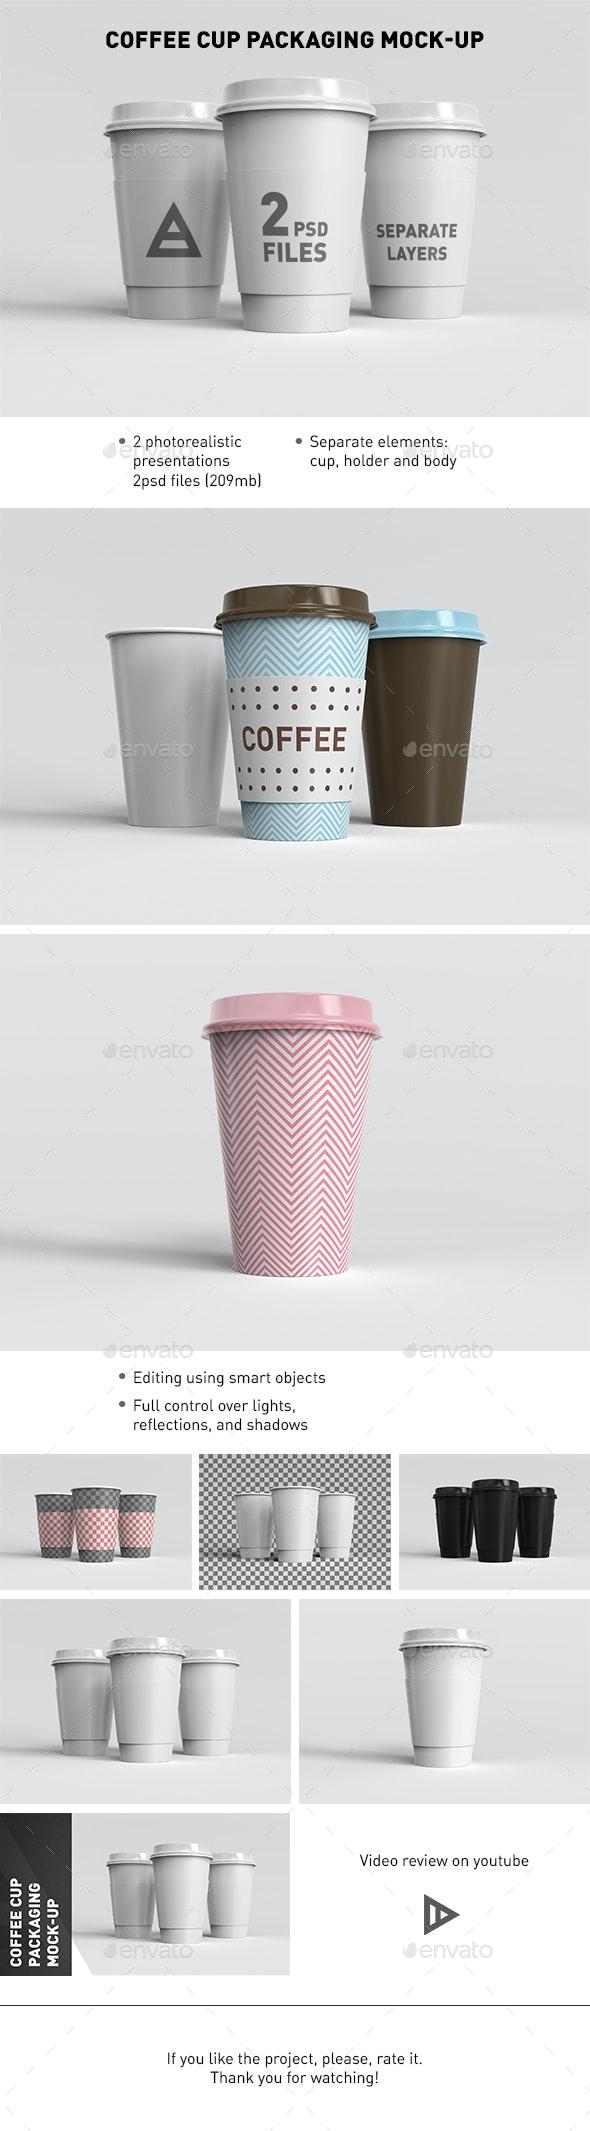 Coffee Cup Packaging Mock-Up - Food and Drink Packaging